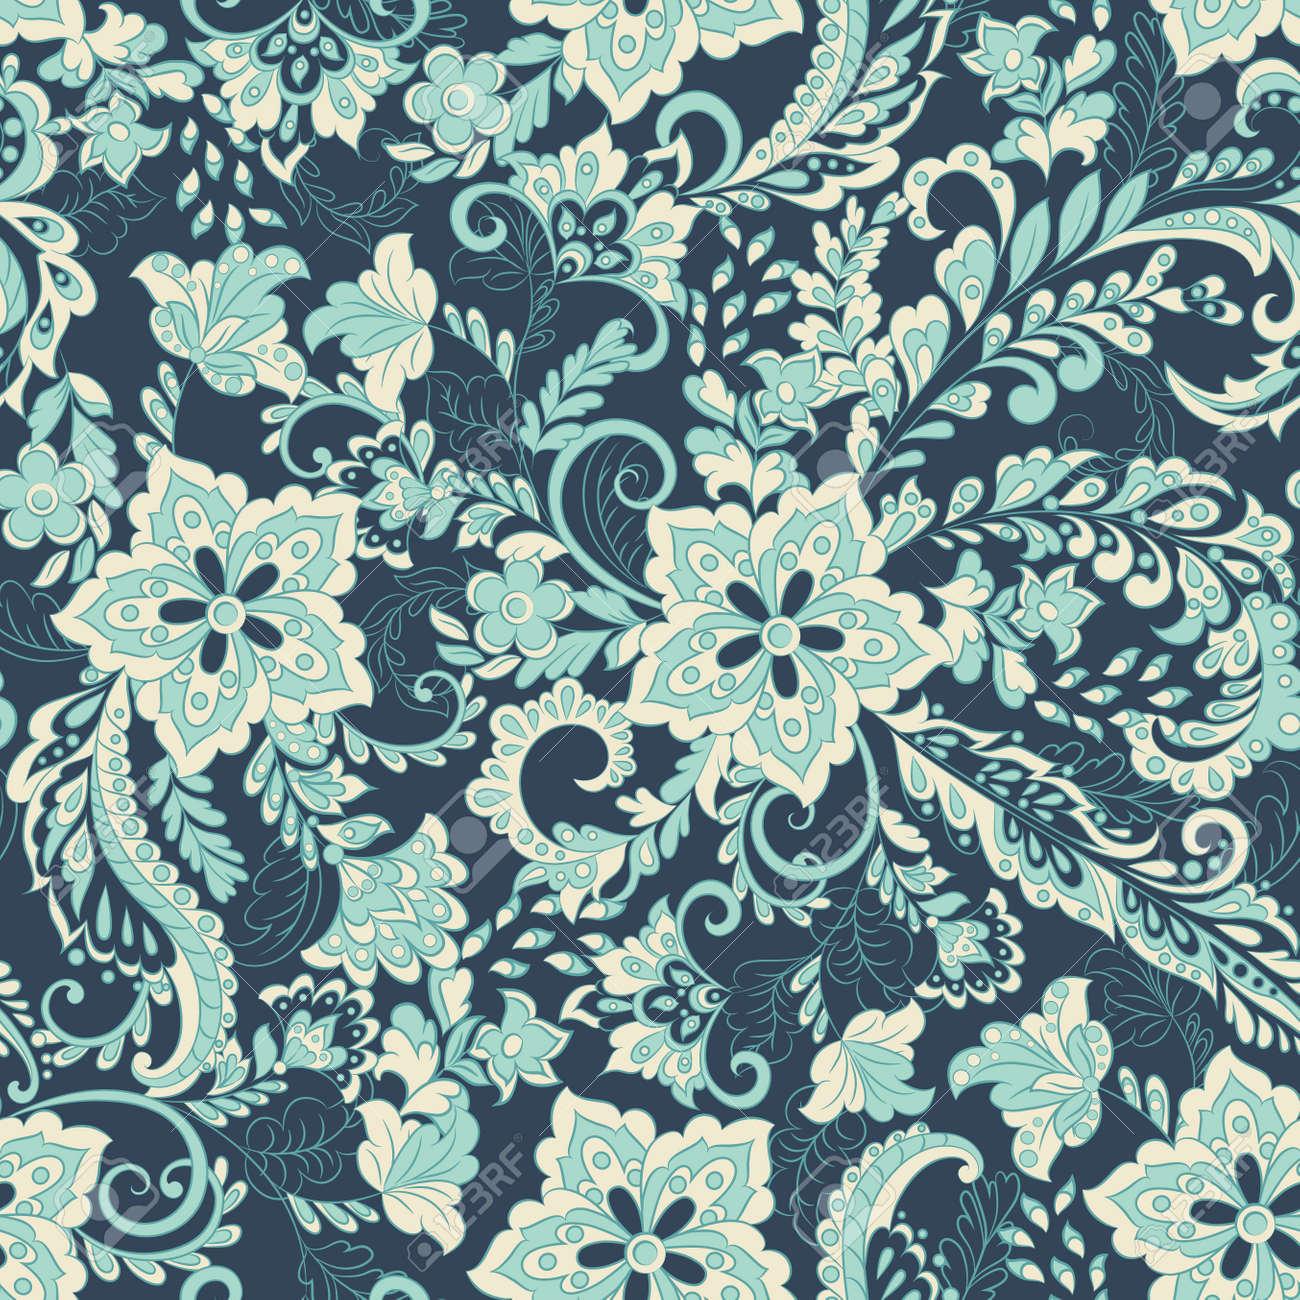 vintage floral seamless patten - 141129280